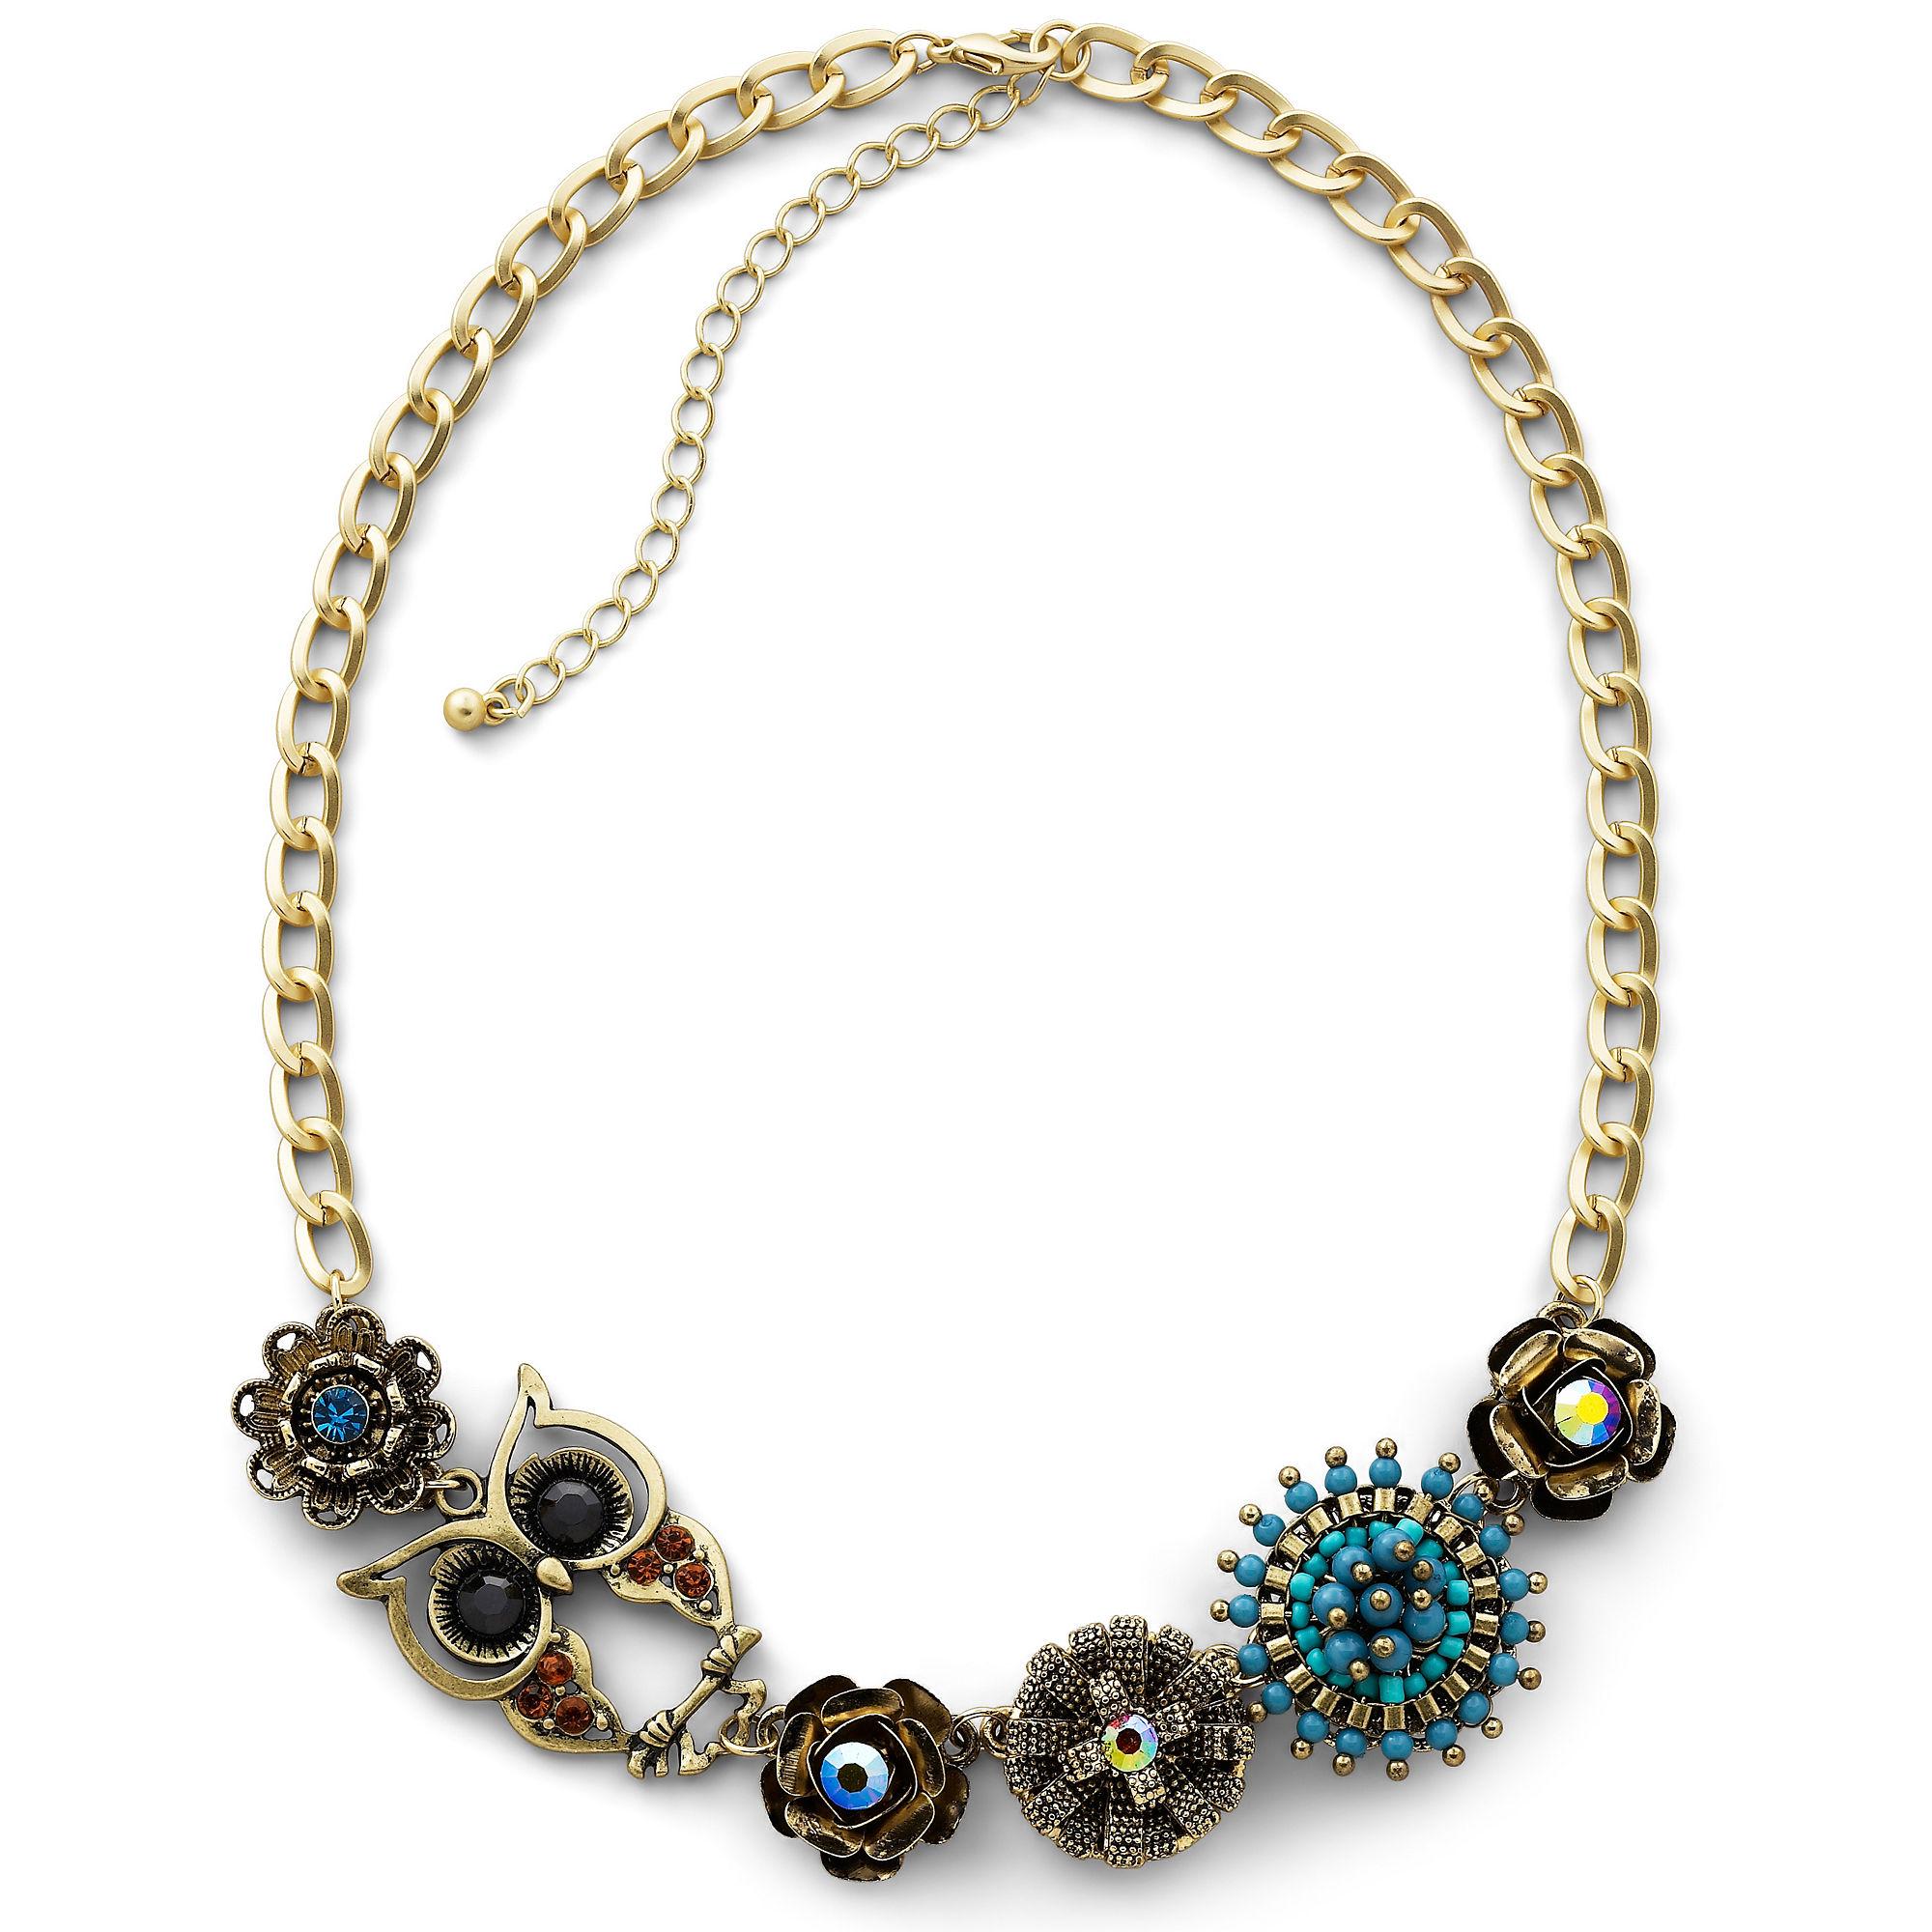 Decree Charm Necklace